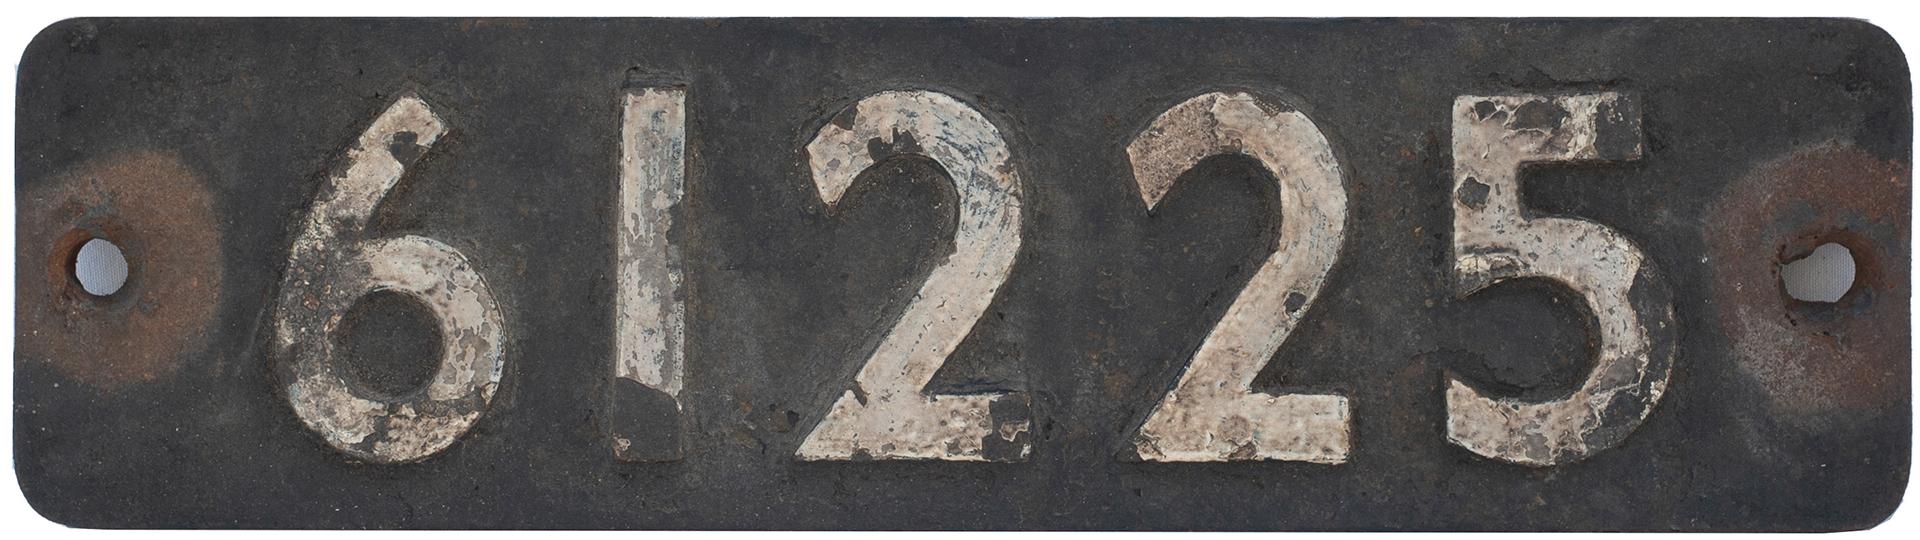 Smokebox Numberplate 61225. Ex LNER Thompson b1